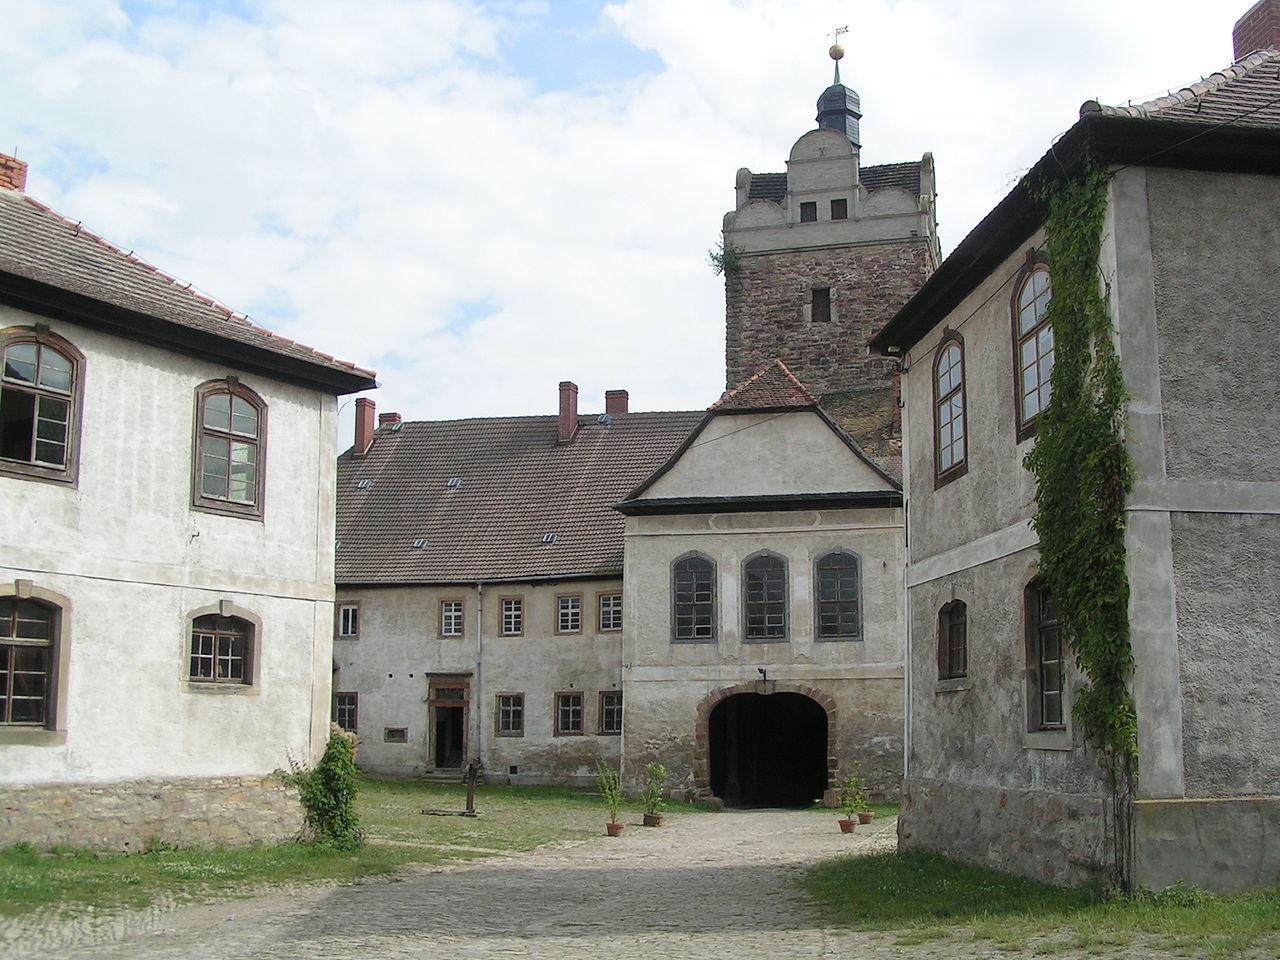 Bild Schloss Allstedt